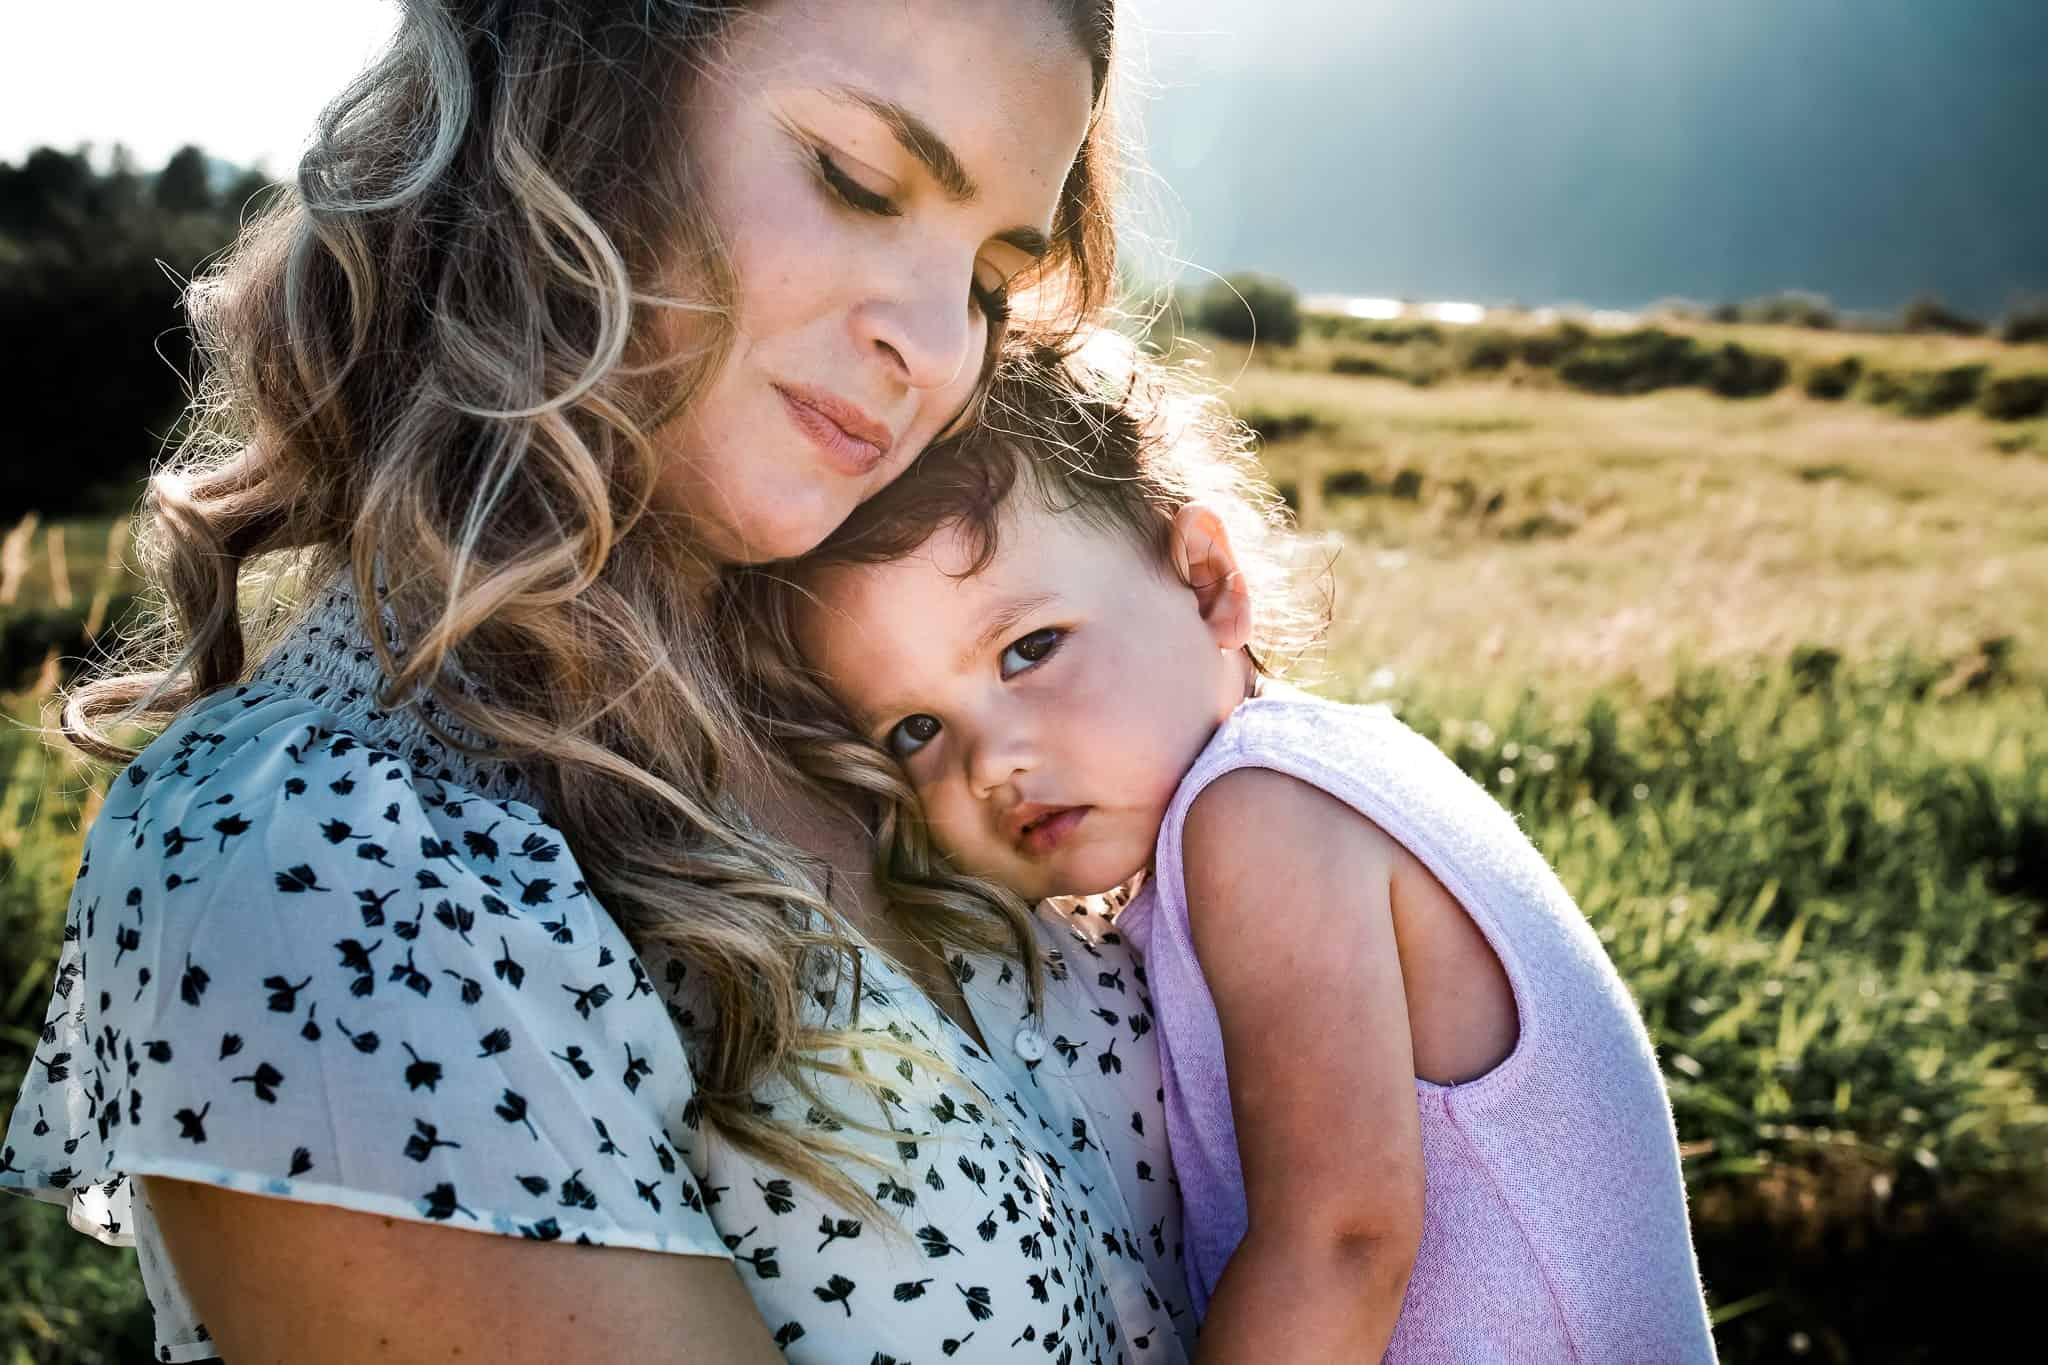 mom holding little girl against her shoulder in the sunset